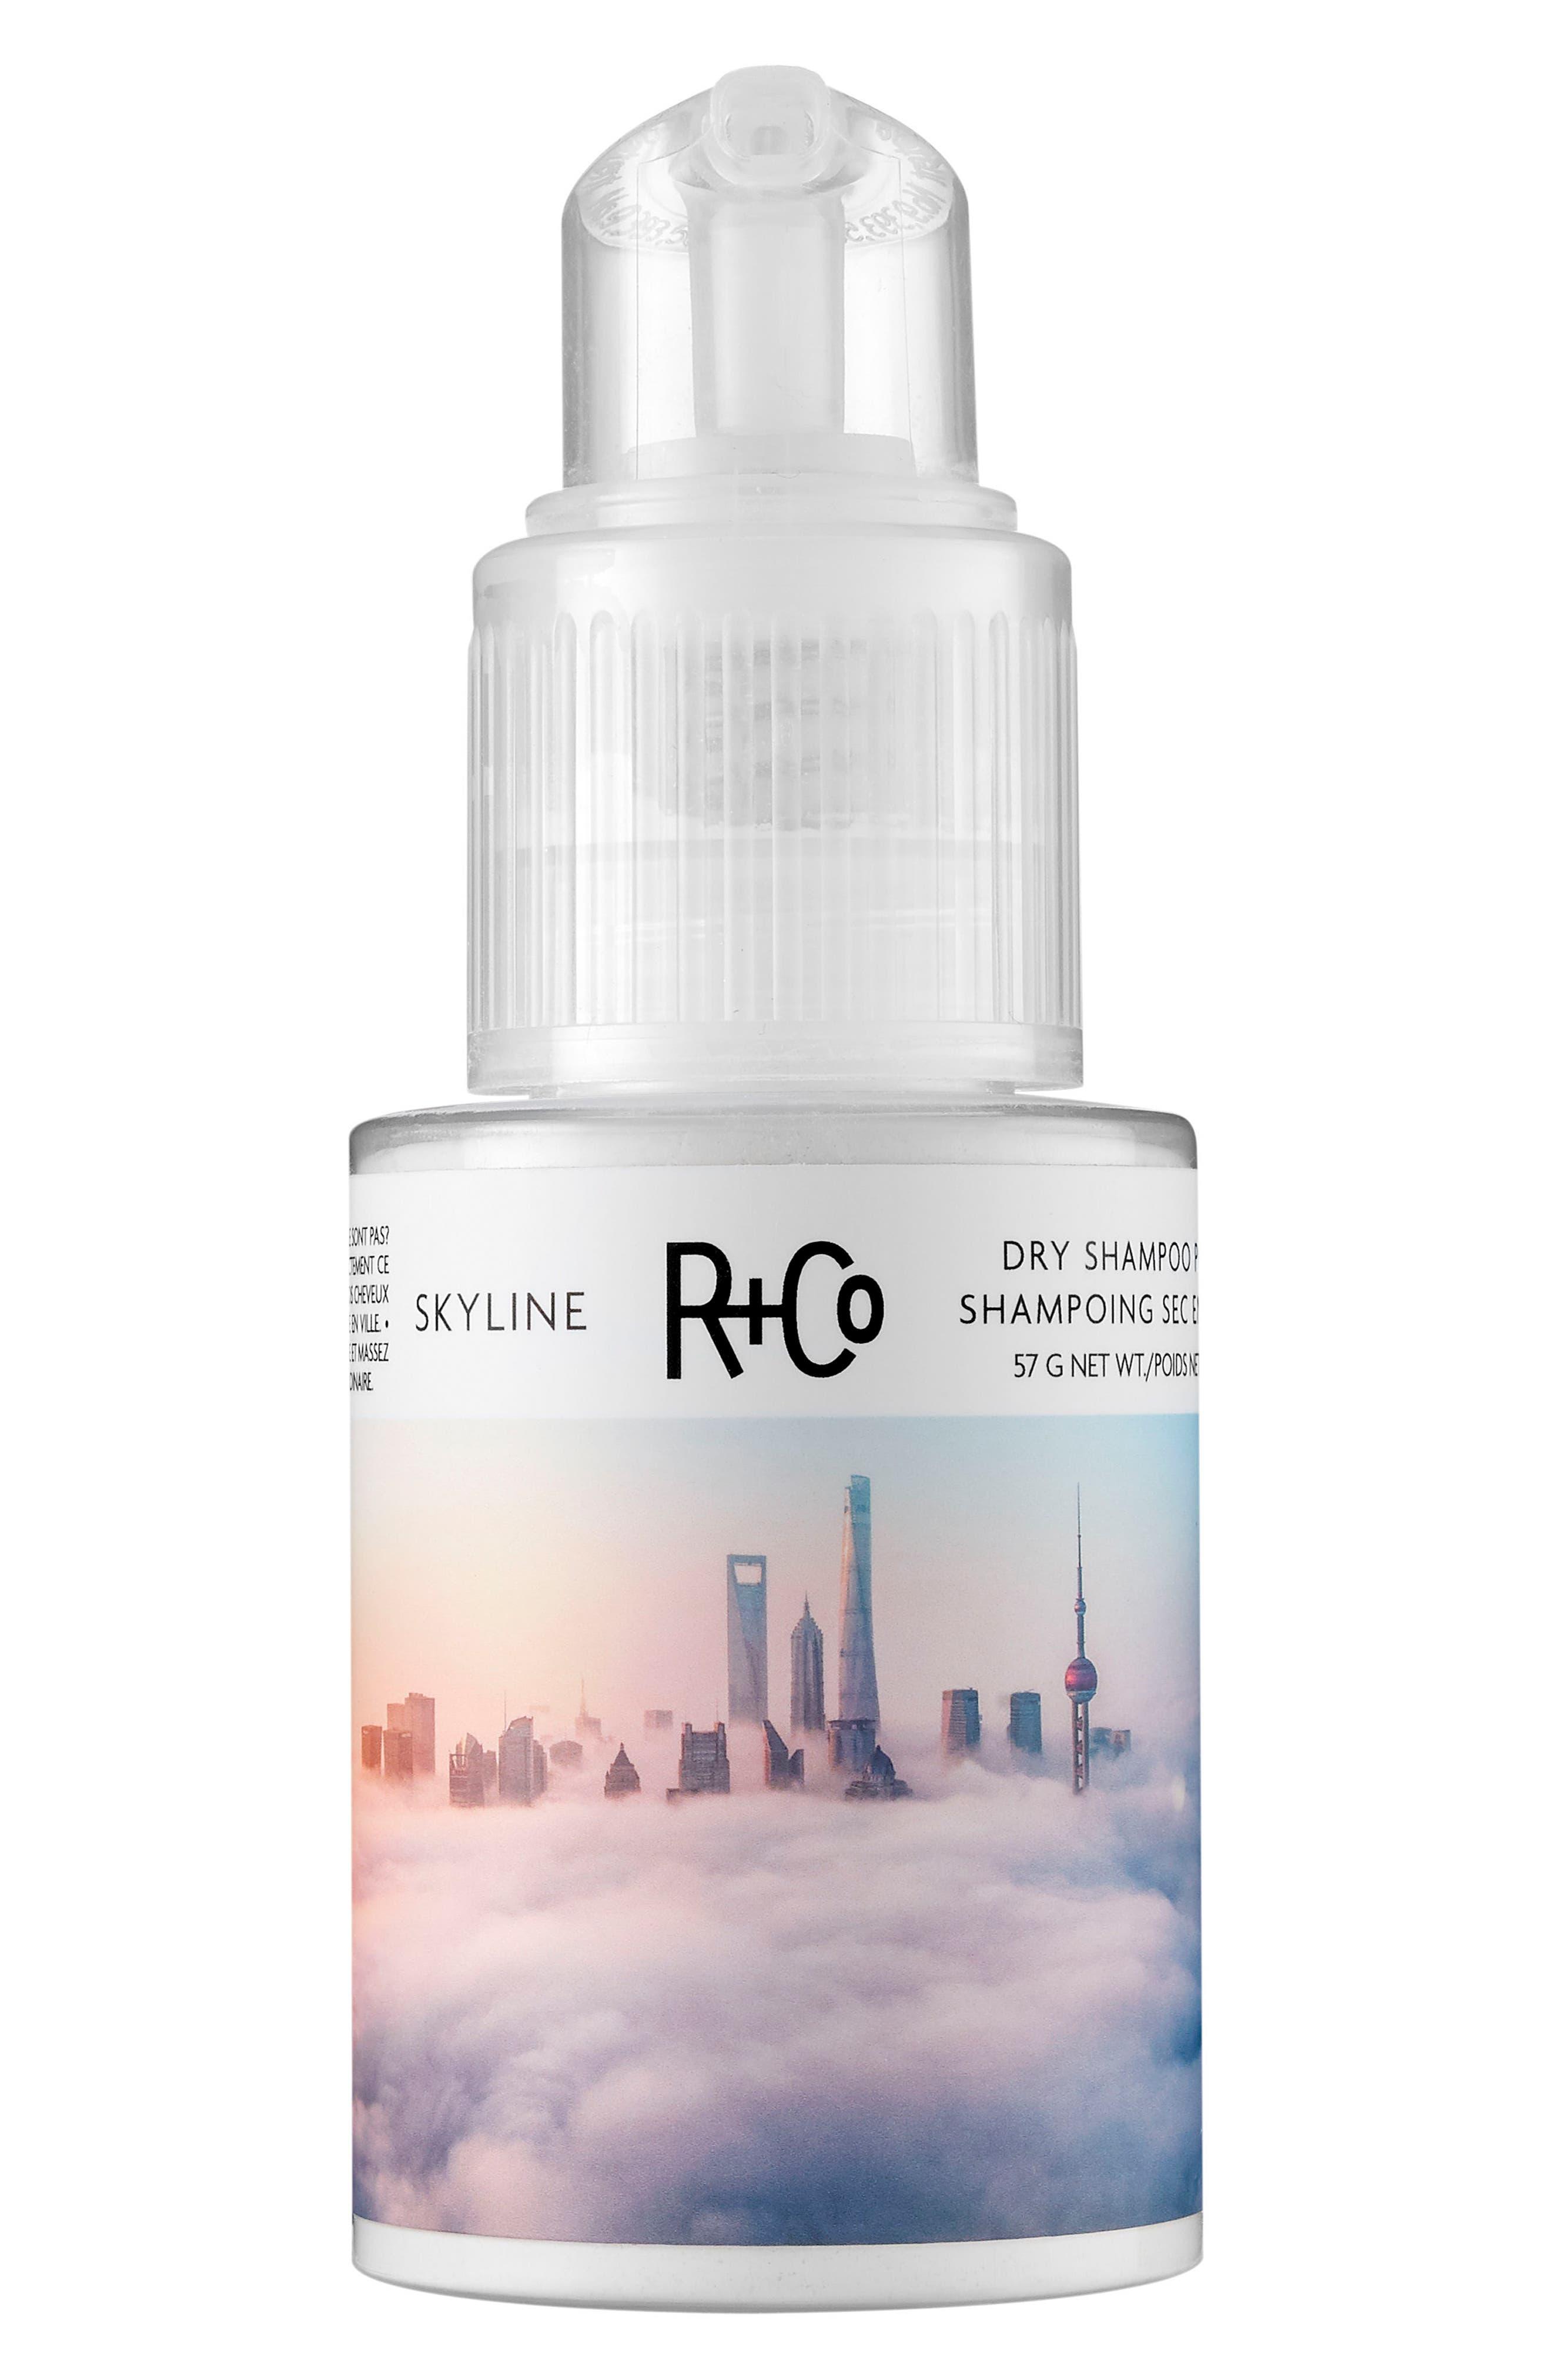 Main Image - SPACE.NK.apothecary R+Co Skyline Dry Shampoo Powder